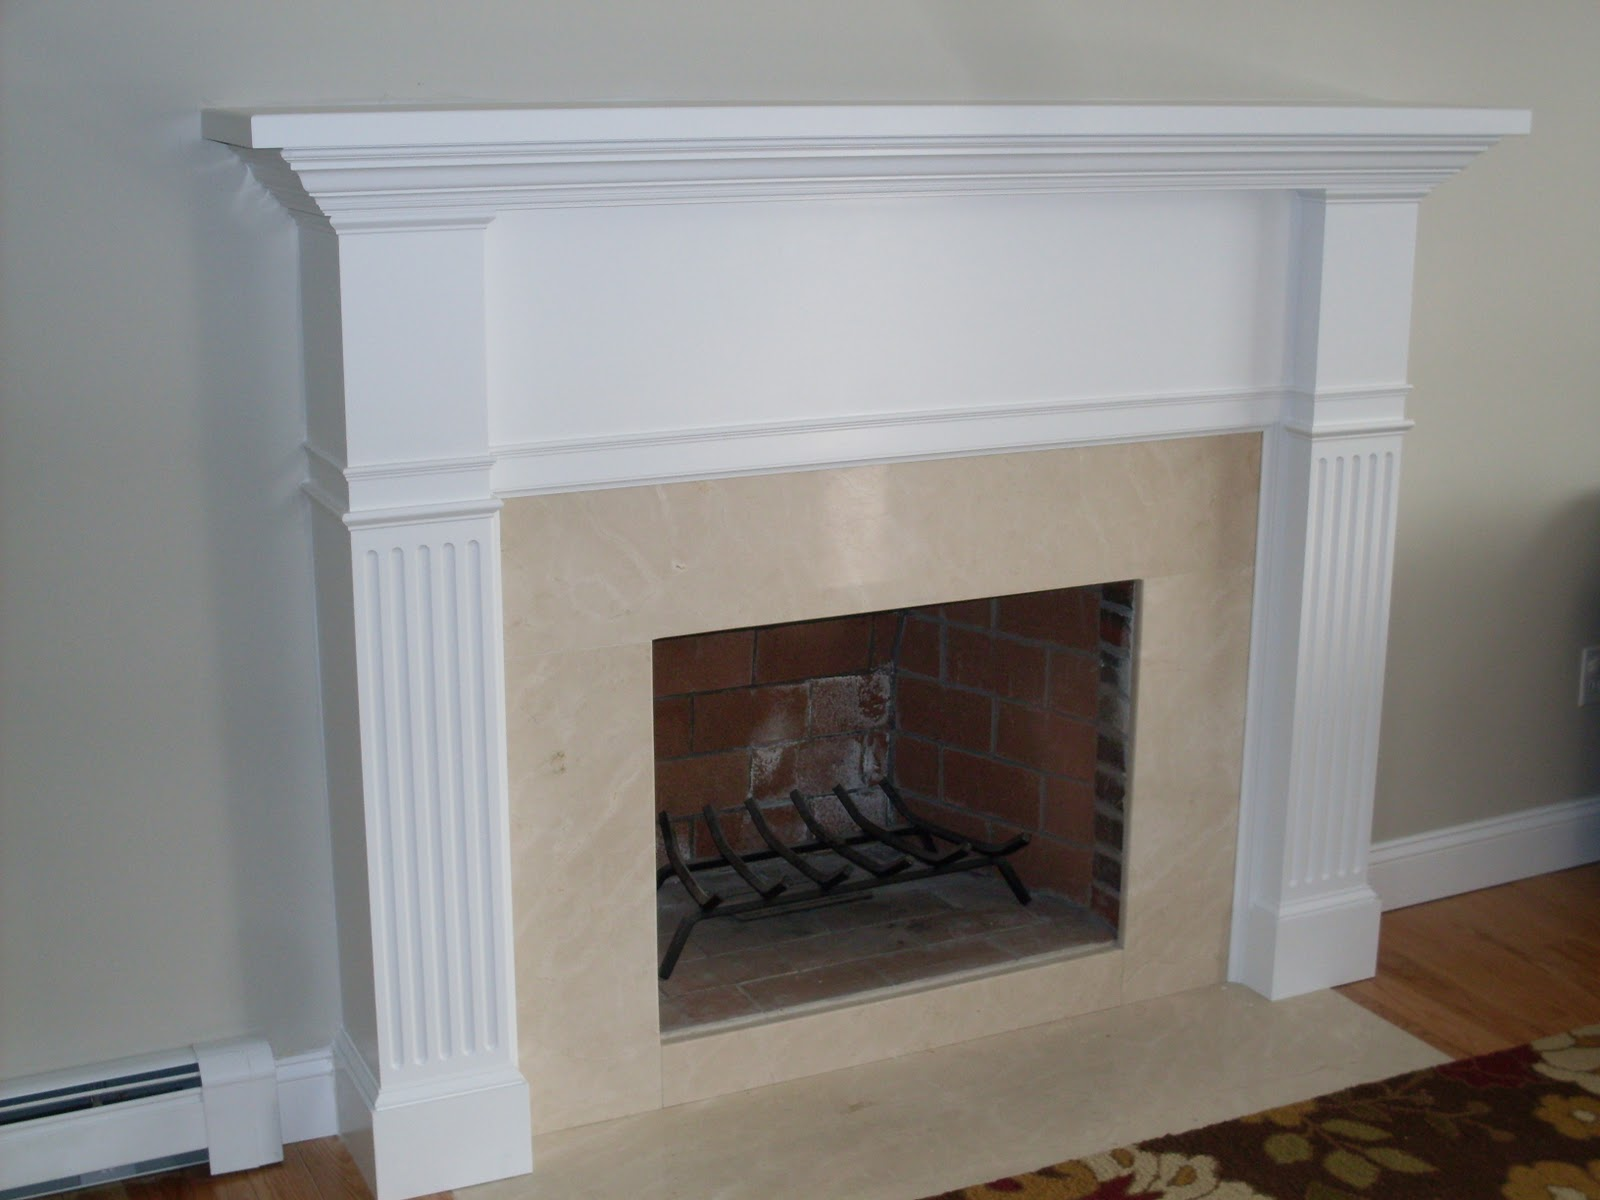 Fireplace Mantels And Surrounds: Custom Fireplace Mantel